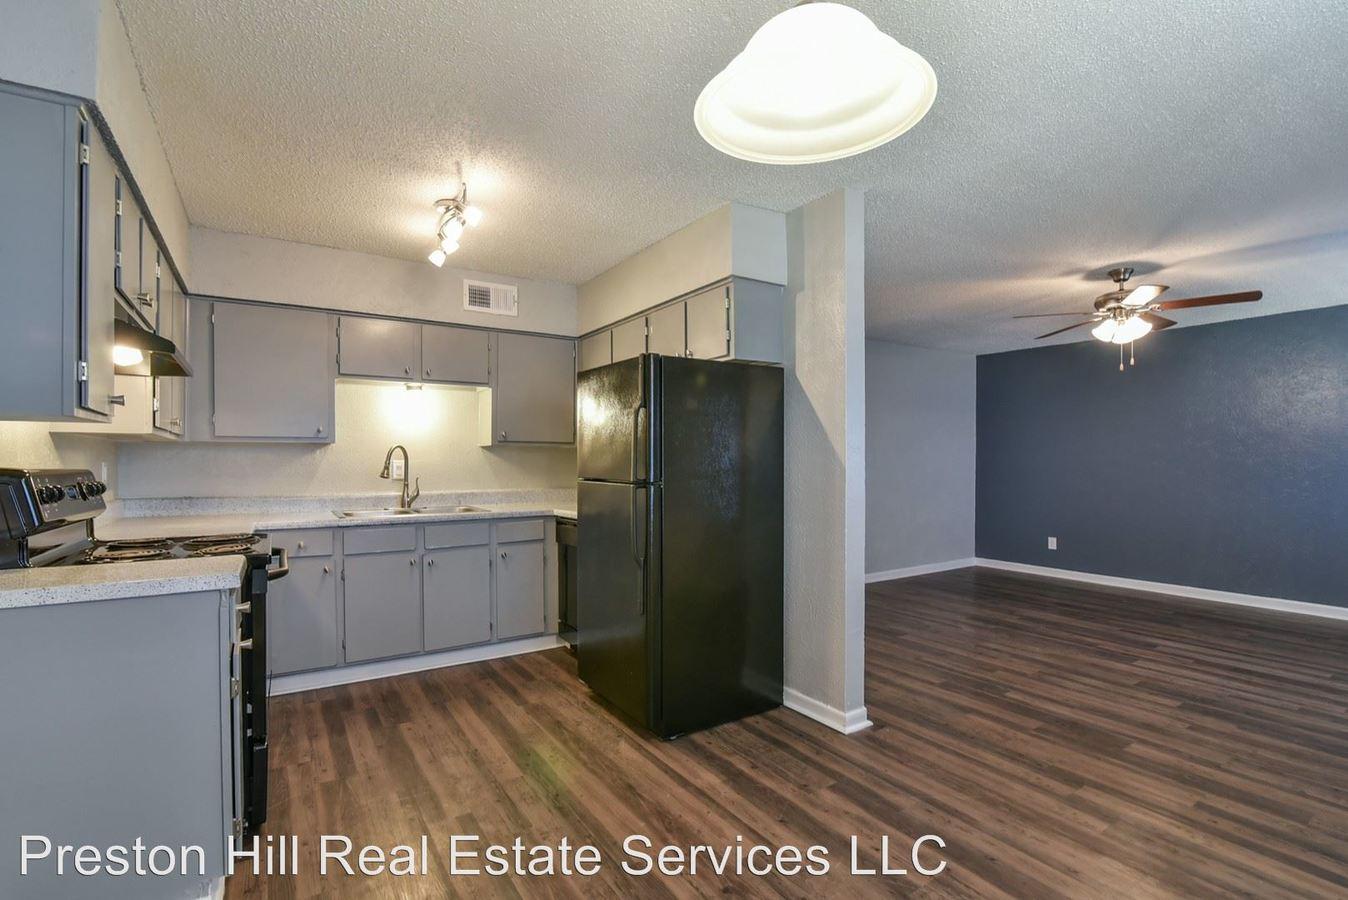 2 Bedrooms 1 Bathroom Apartment for rent at 1215 N. Cooper in Arlington, TX